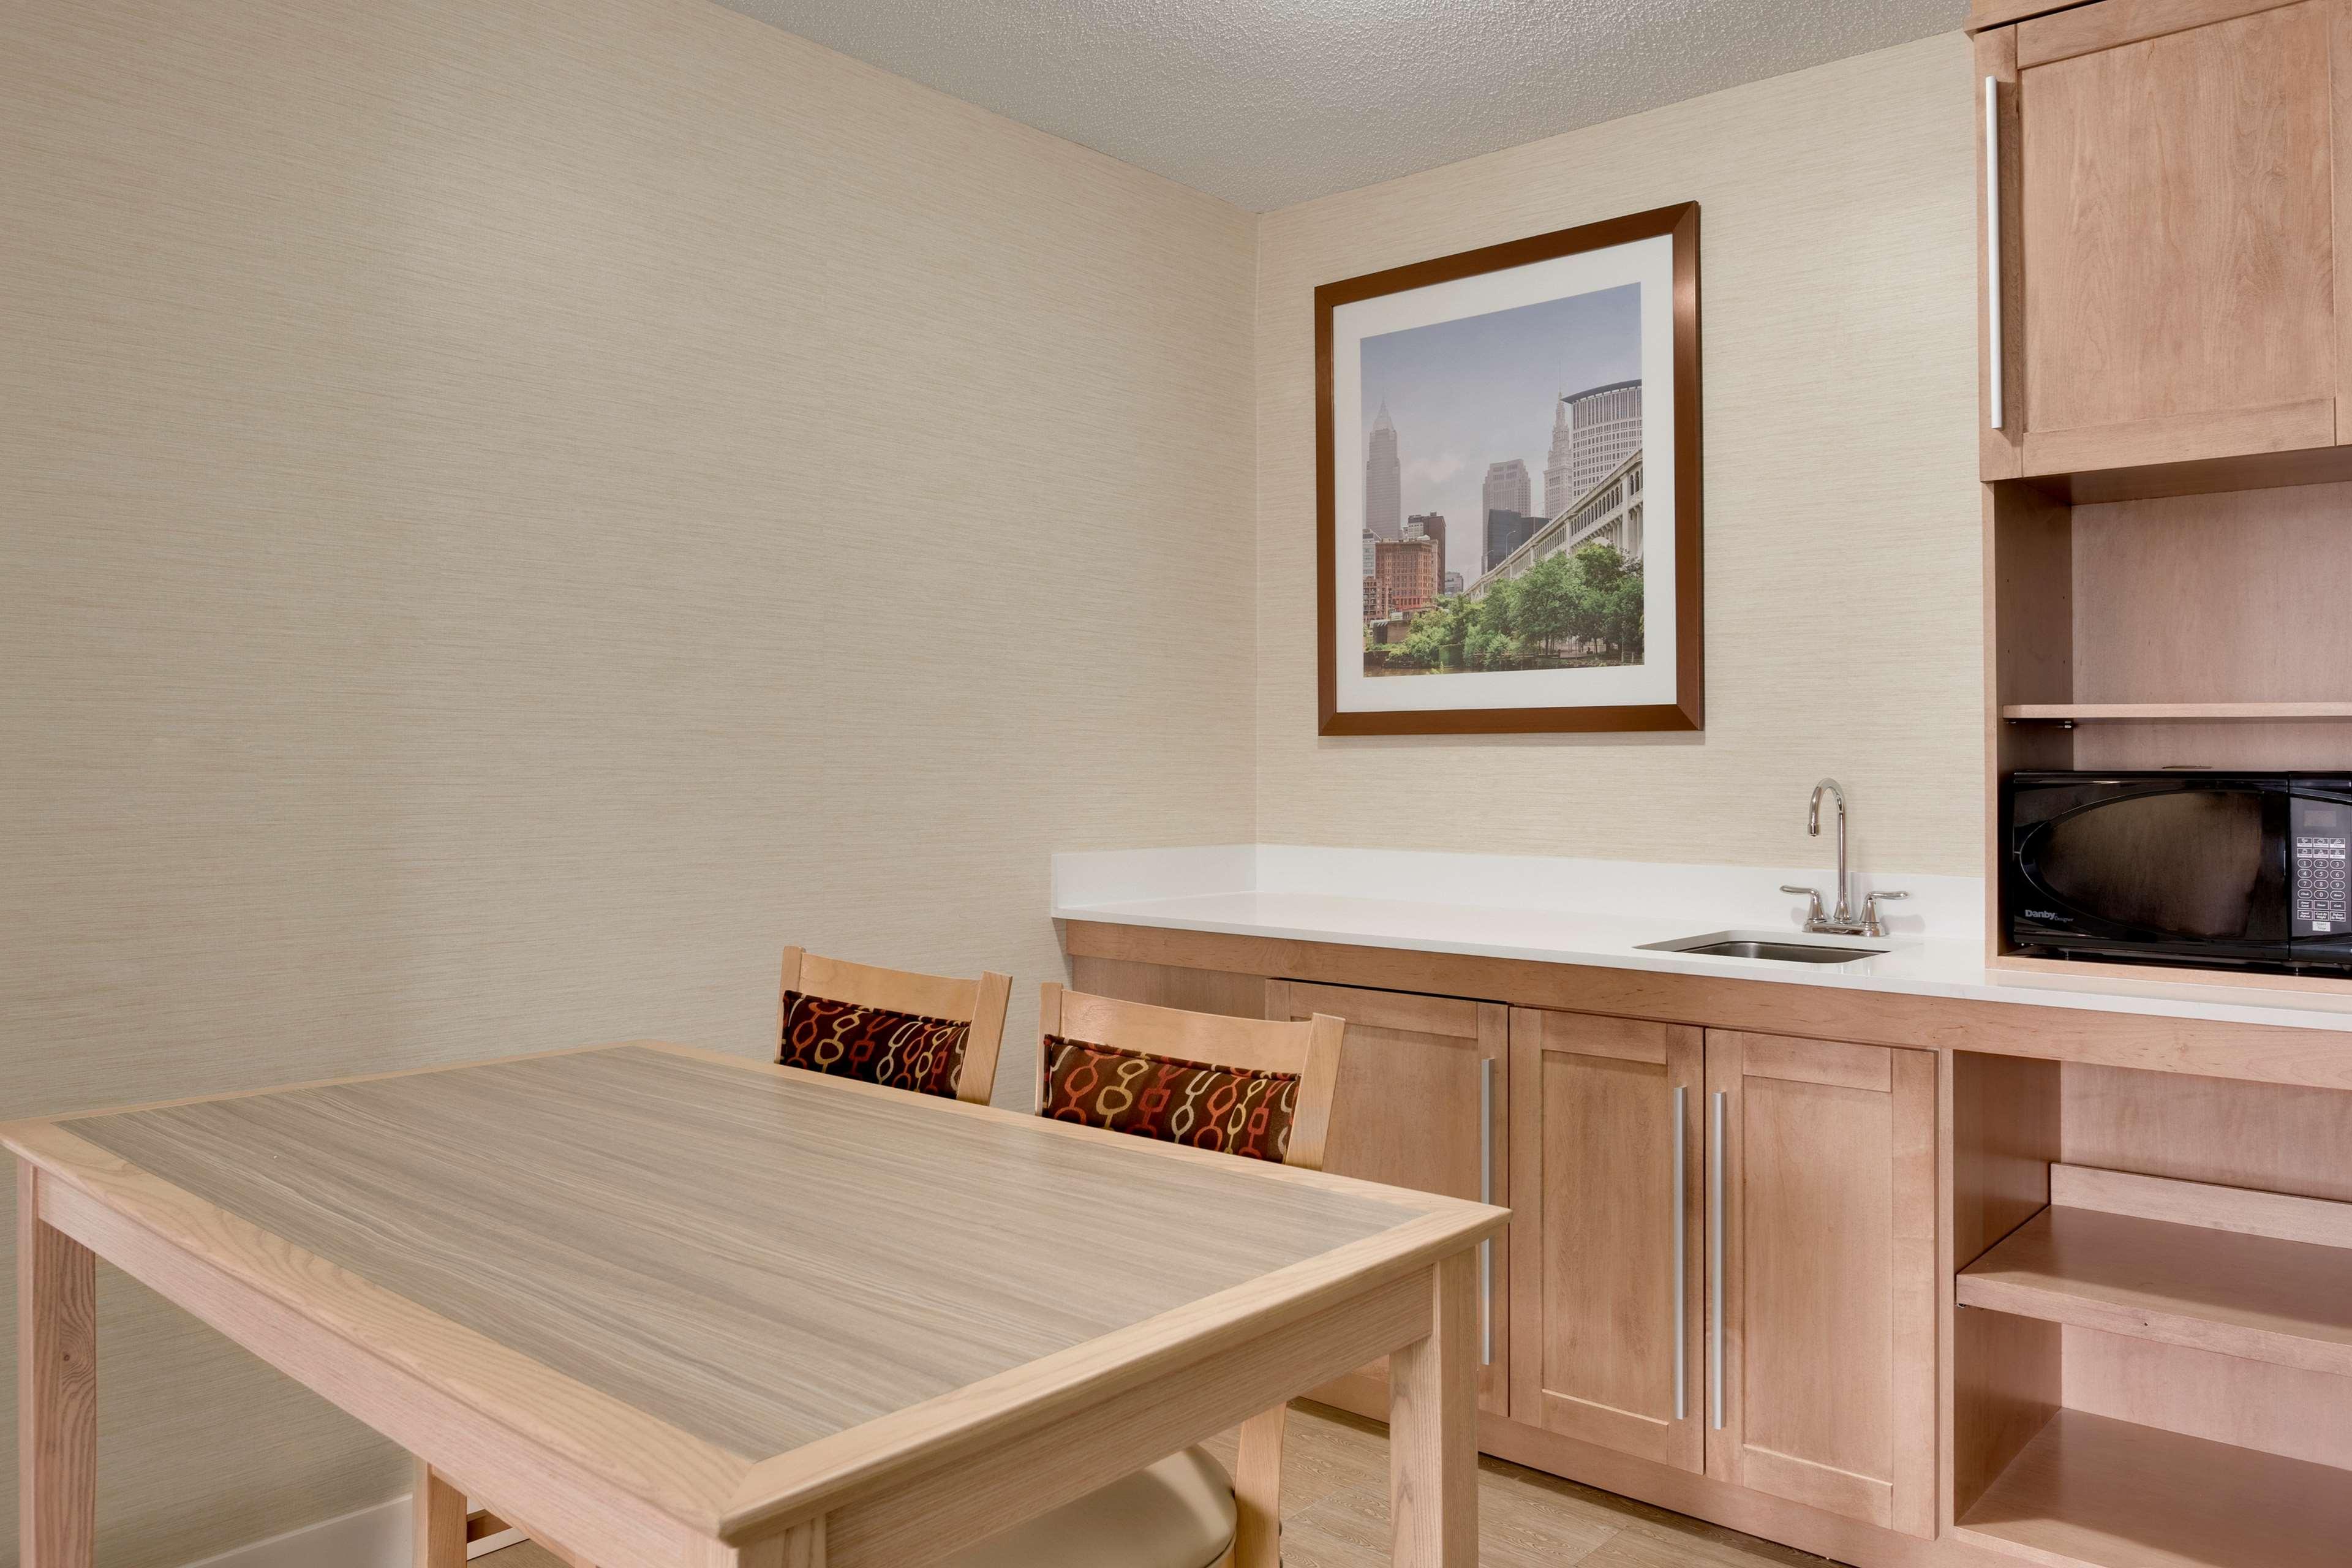 Hampton Inn & Suites Cleveland/Independence image 3